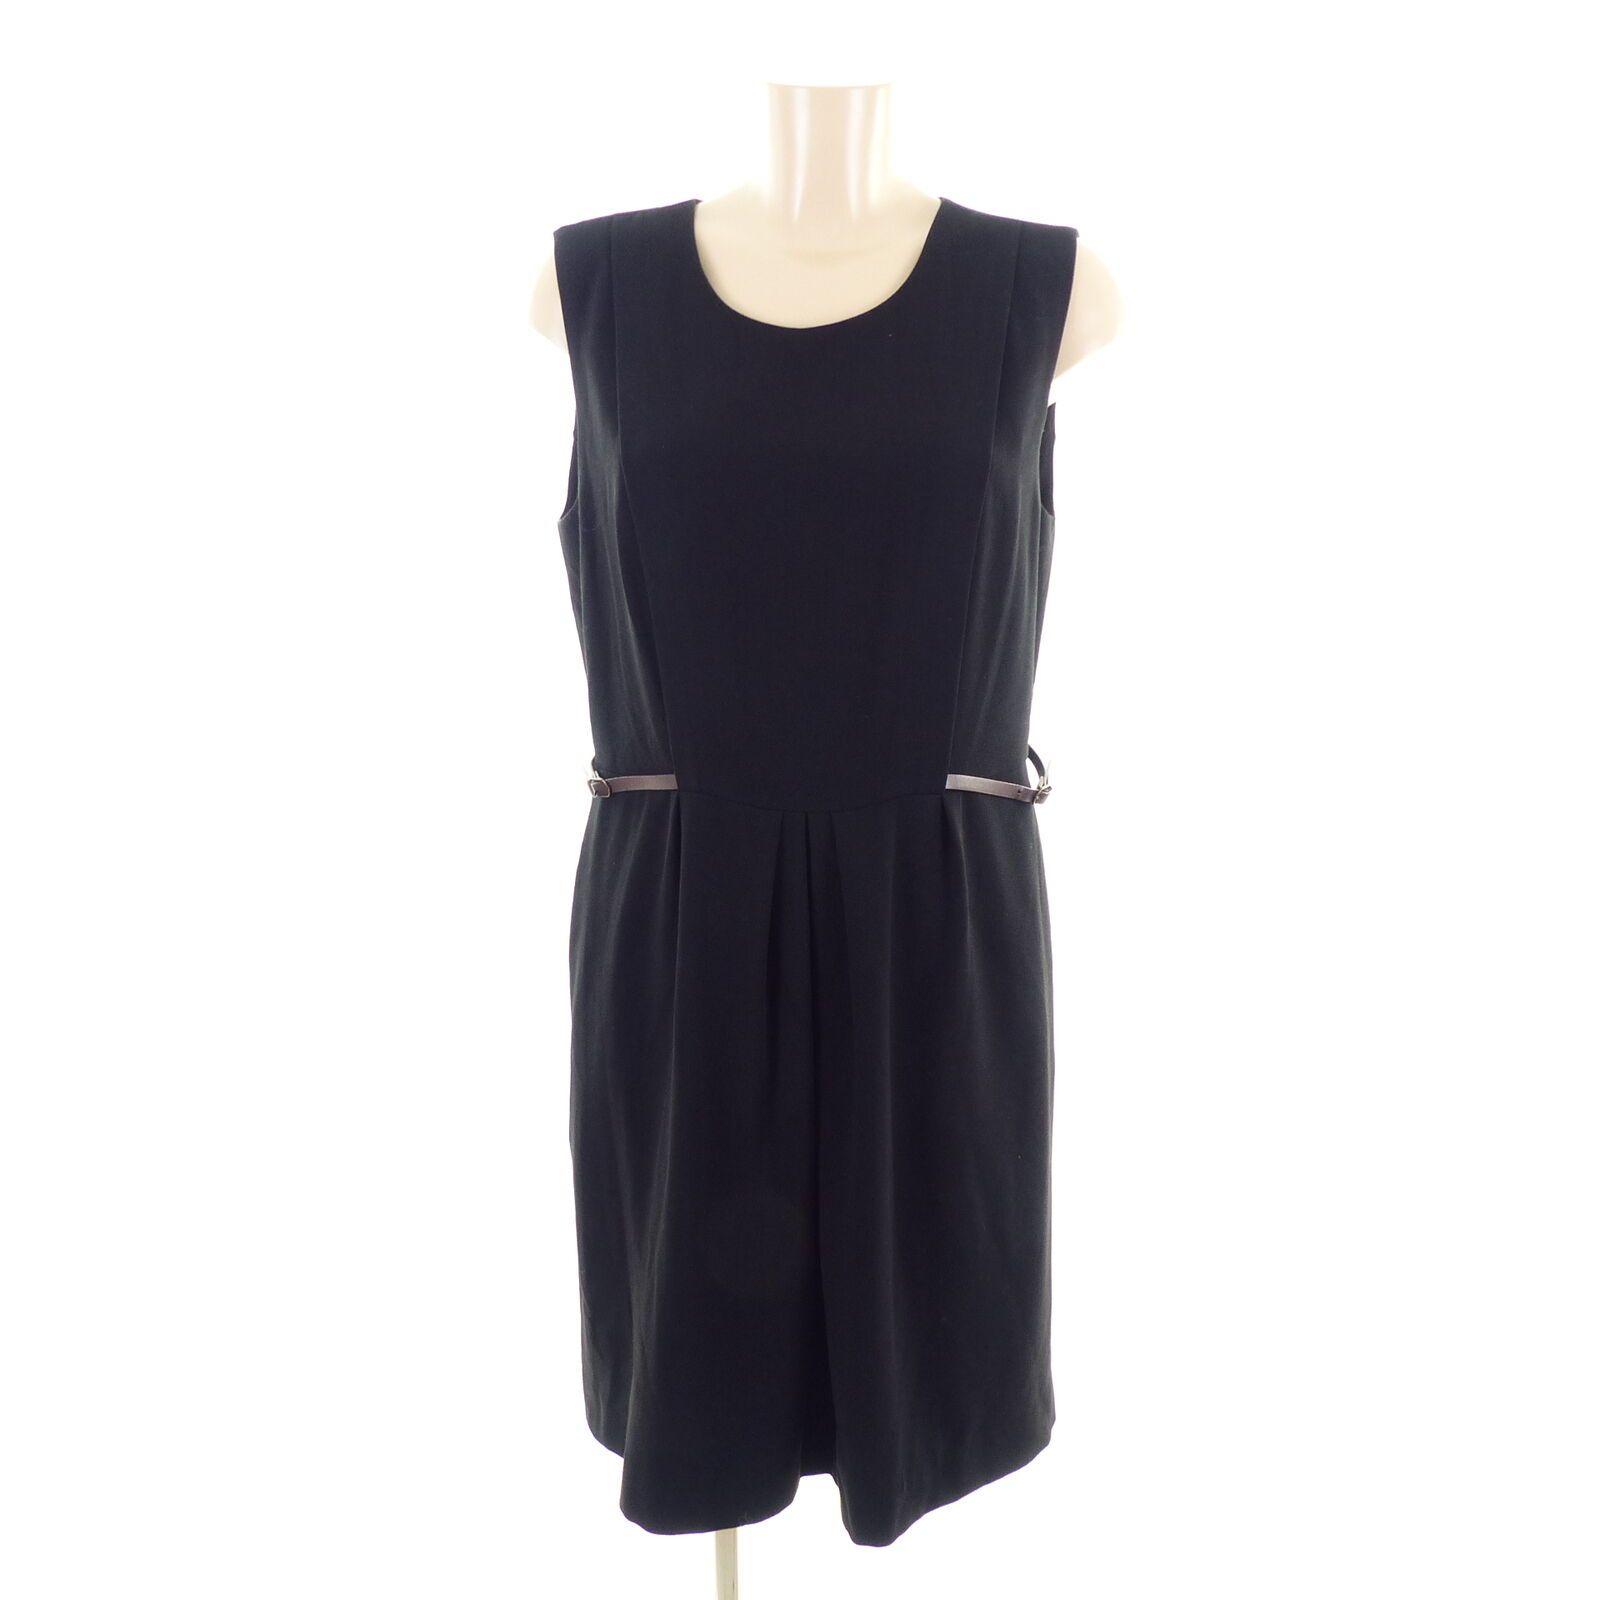 NICE THINGS Kleid Dress Damen Etuikleid Schnallen Schwarz Gr. 13